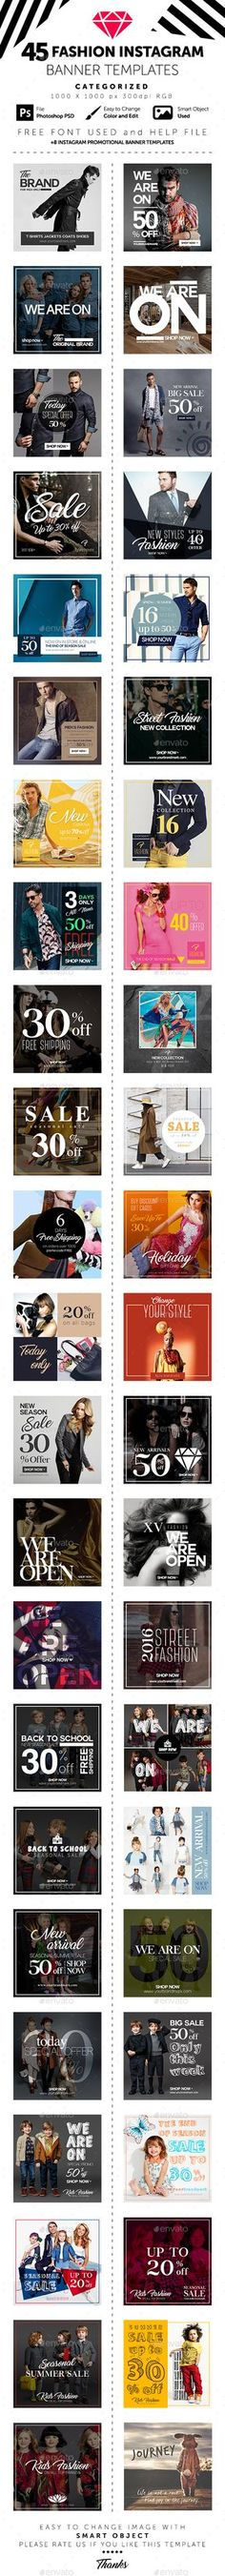 Instagram Banner Templates - Social Media Web Elements